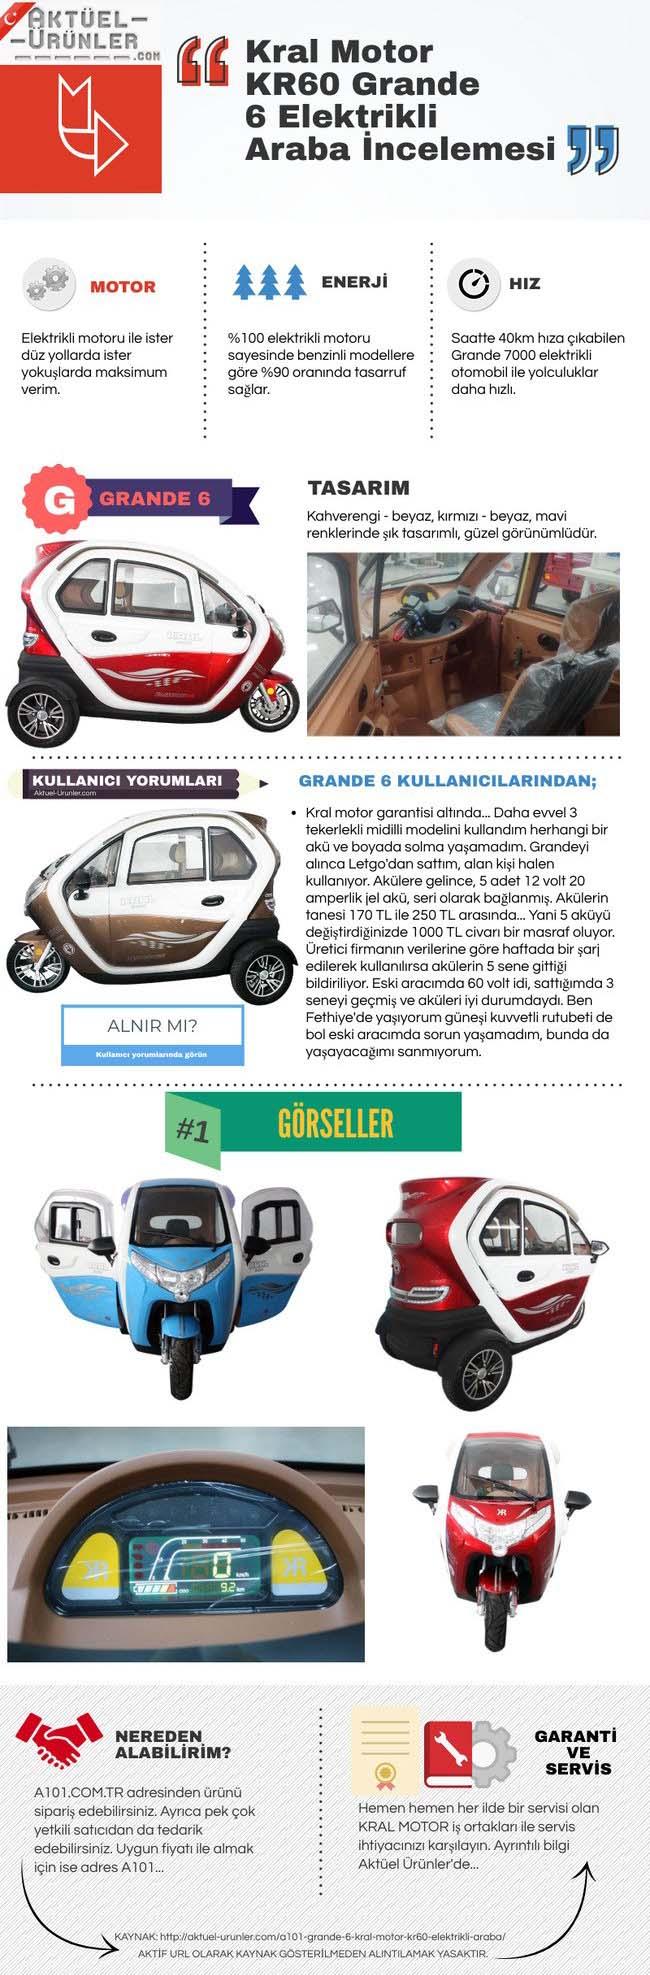 A101 GRANDE 6 ELEKTRİKLİ ARABA DETAYLARI - infografik